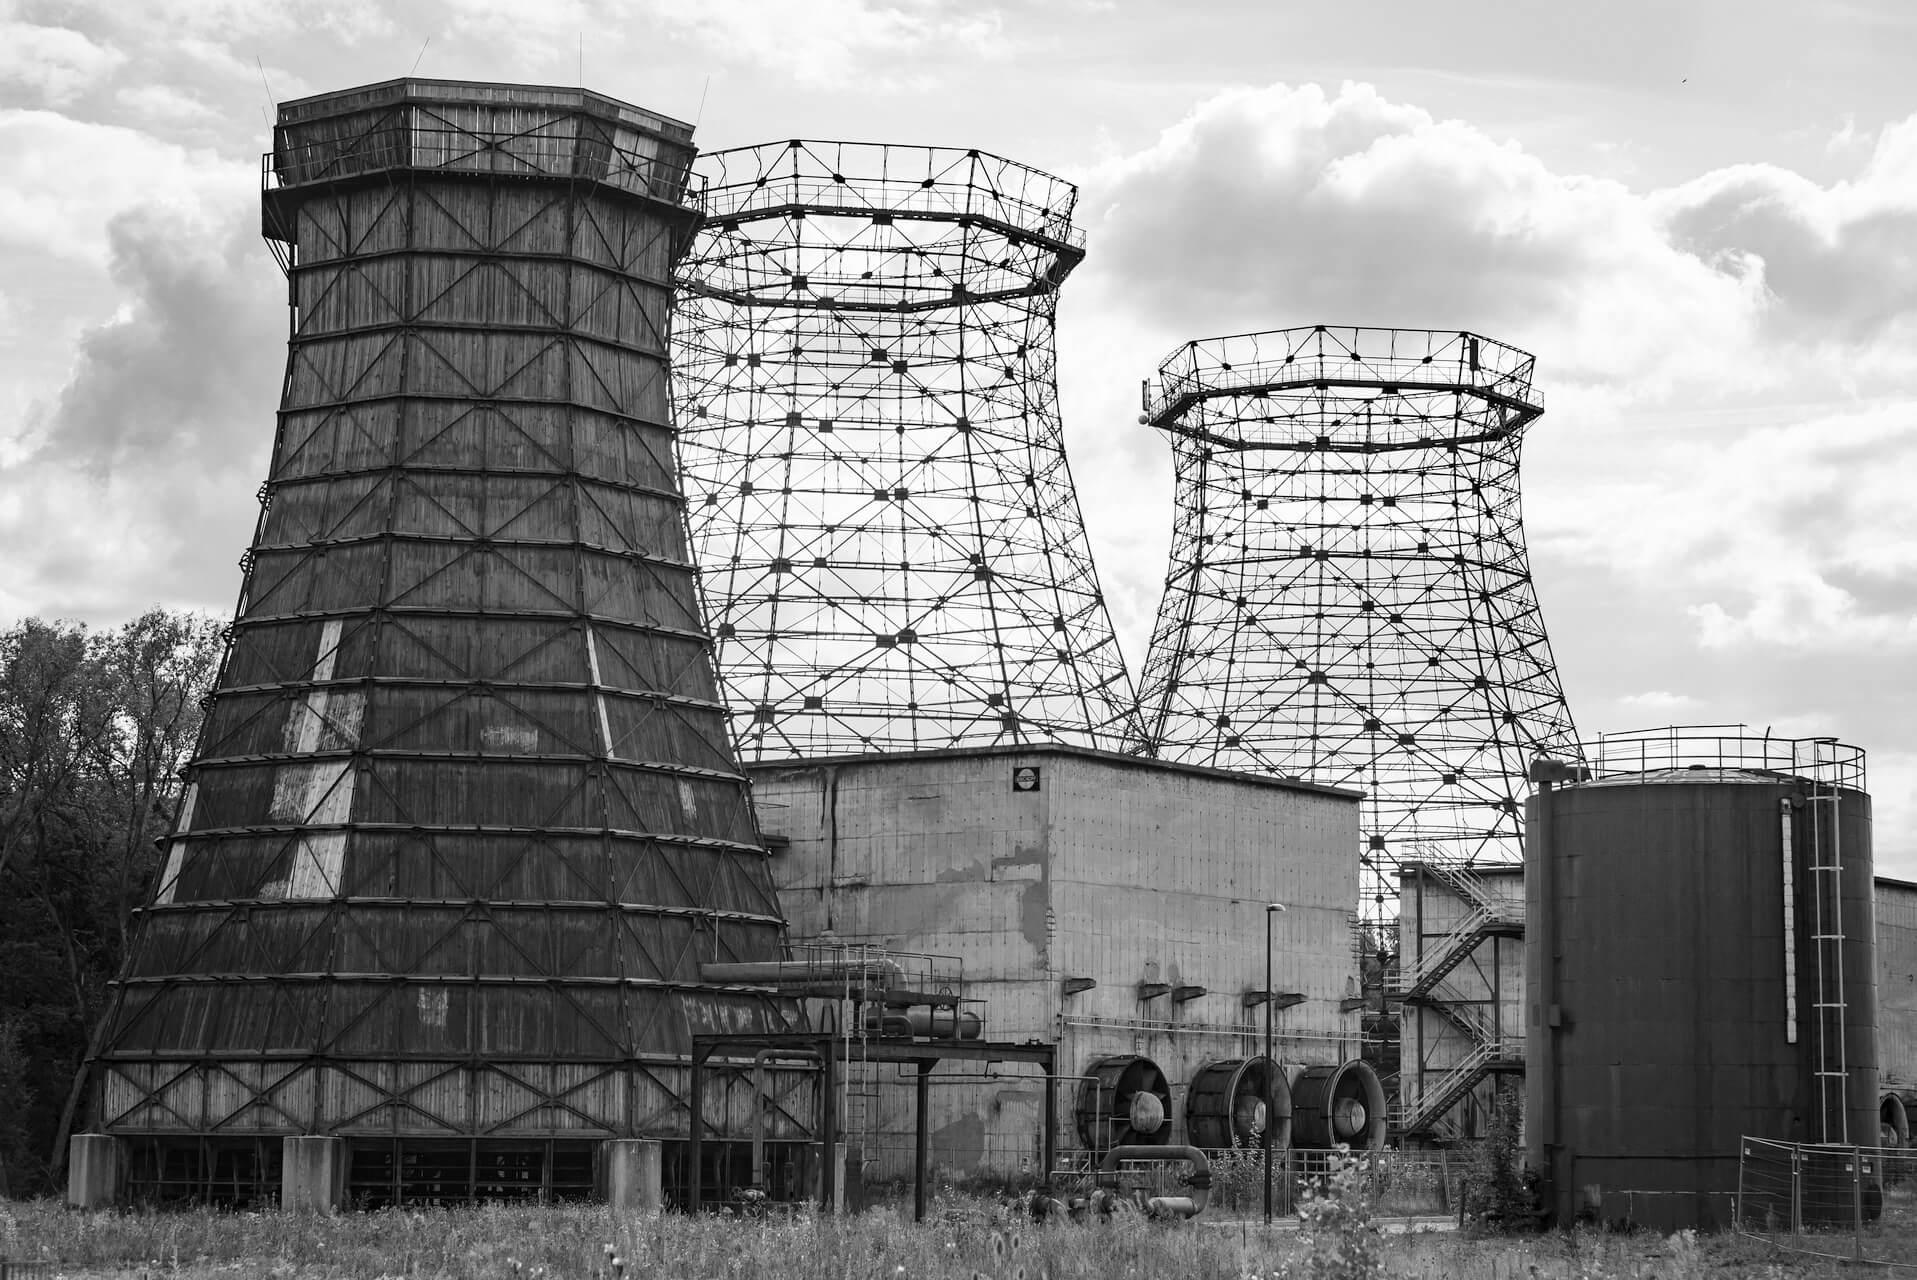 Ruhrgebiet, Industriekultur, Zollverein, Kühltürme